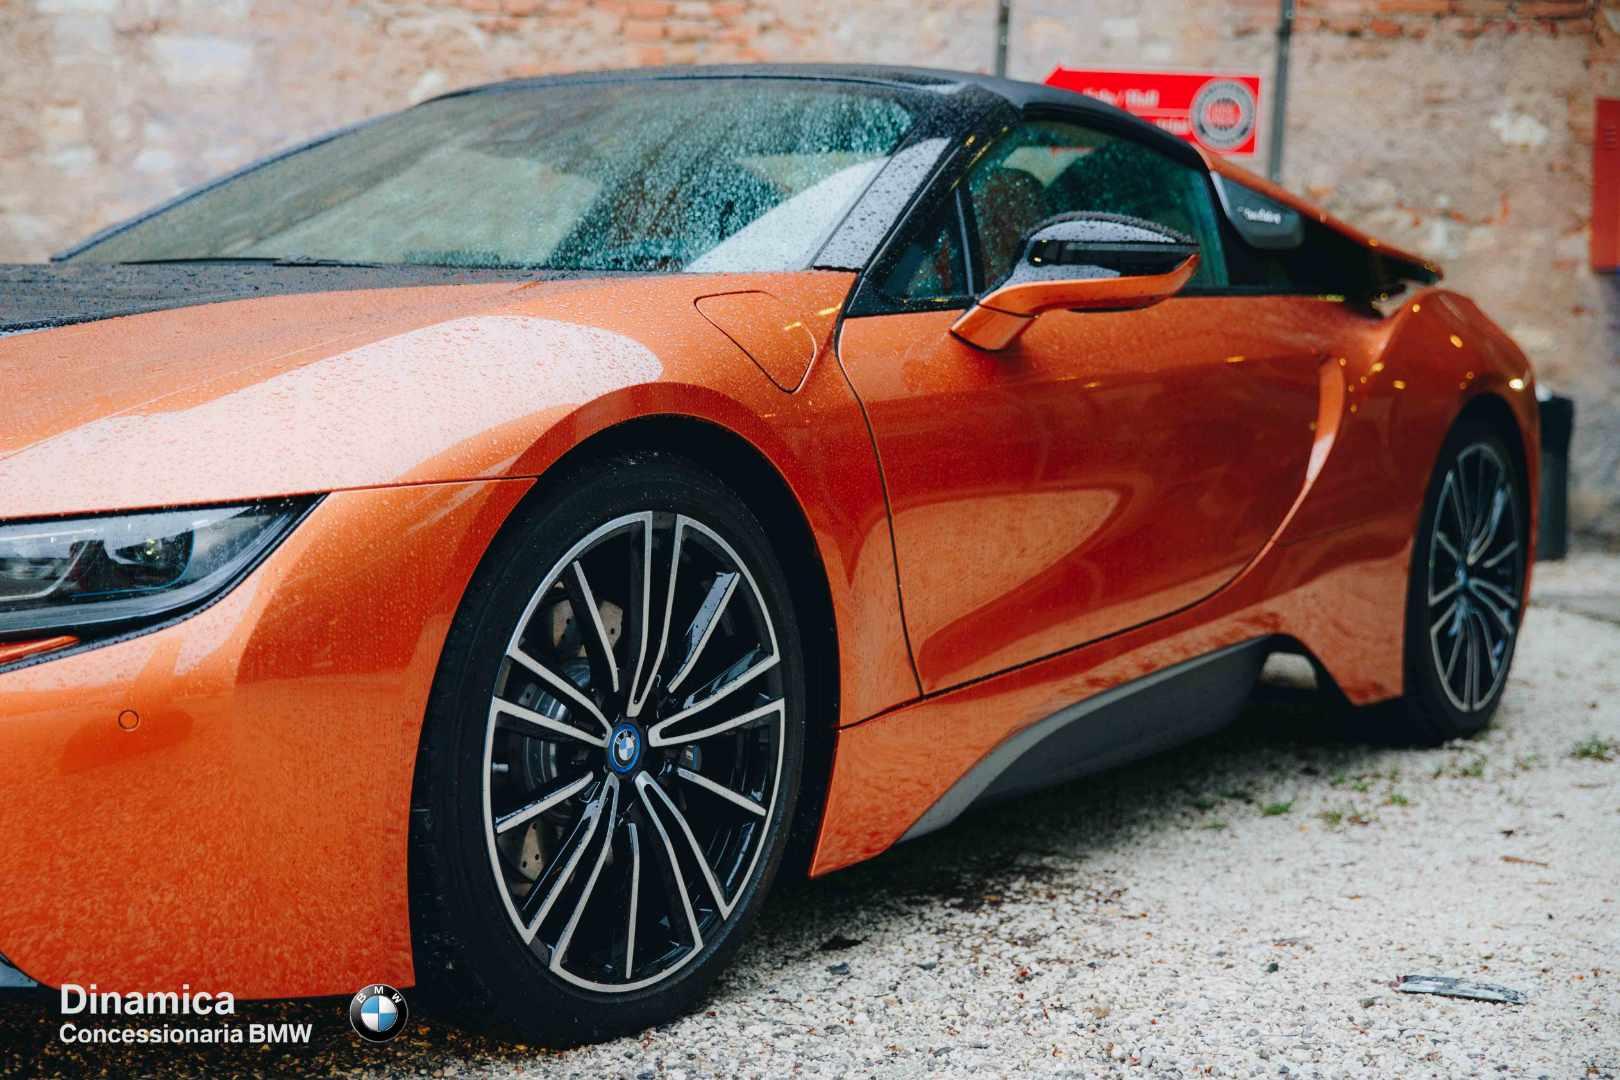 BMW Dinamica  - THE 7-2.jpg